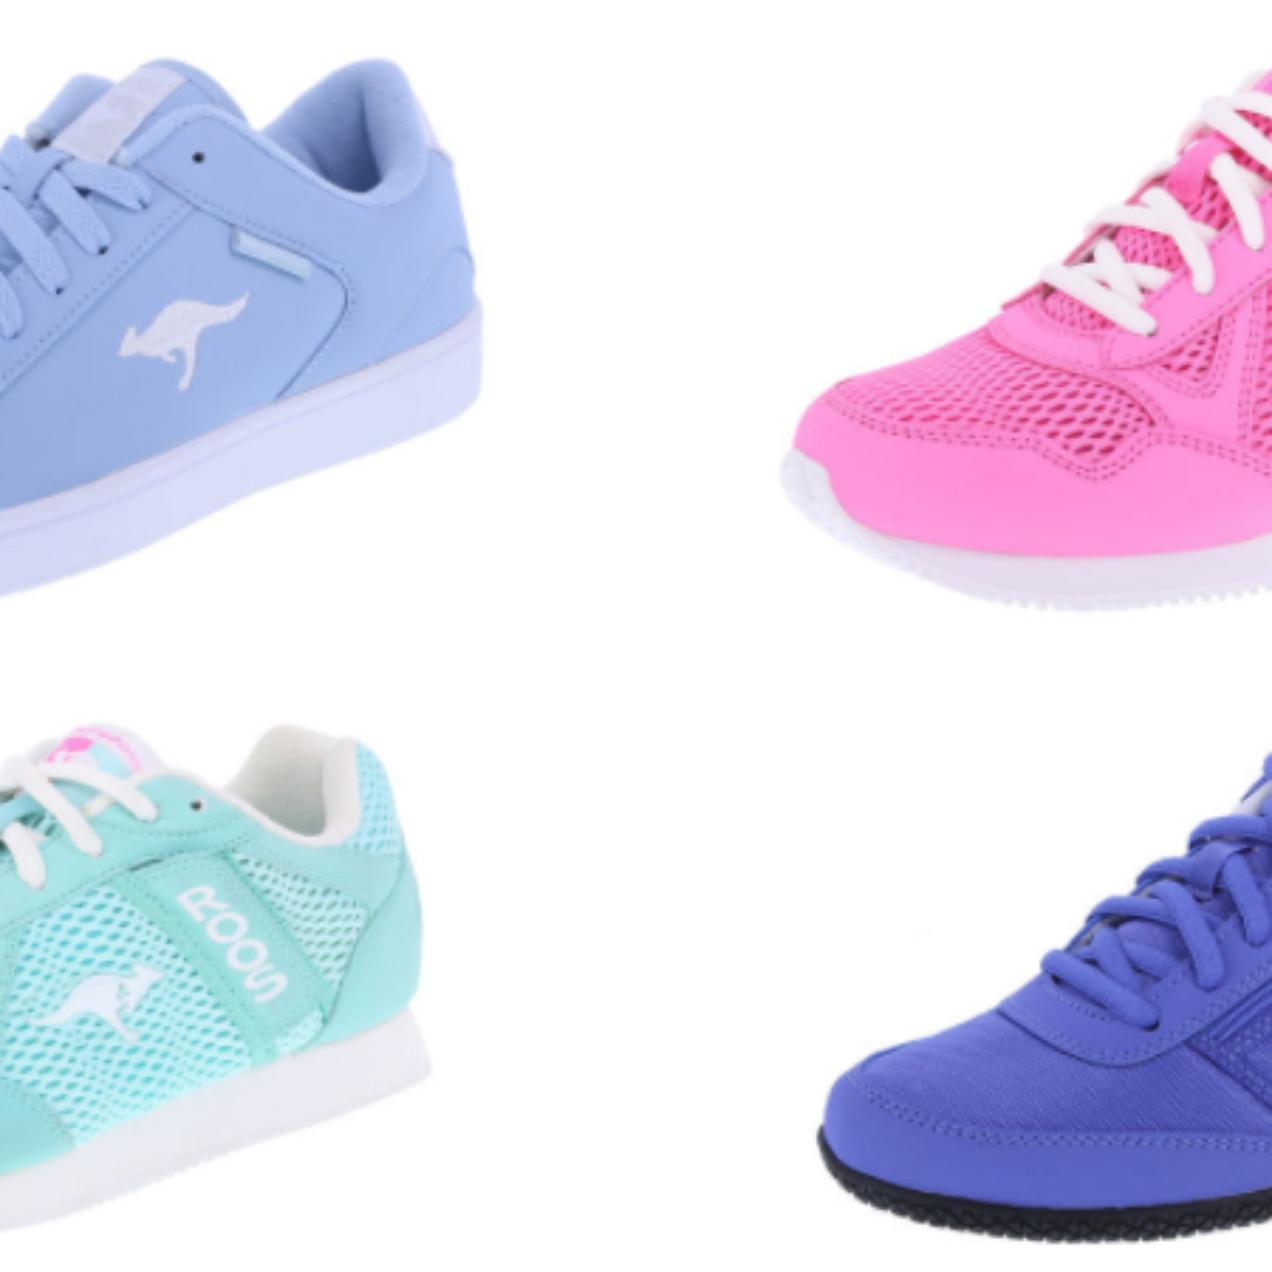 Women's KangaROOS Sneakers Only $7.50 (Regular $49.99)